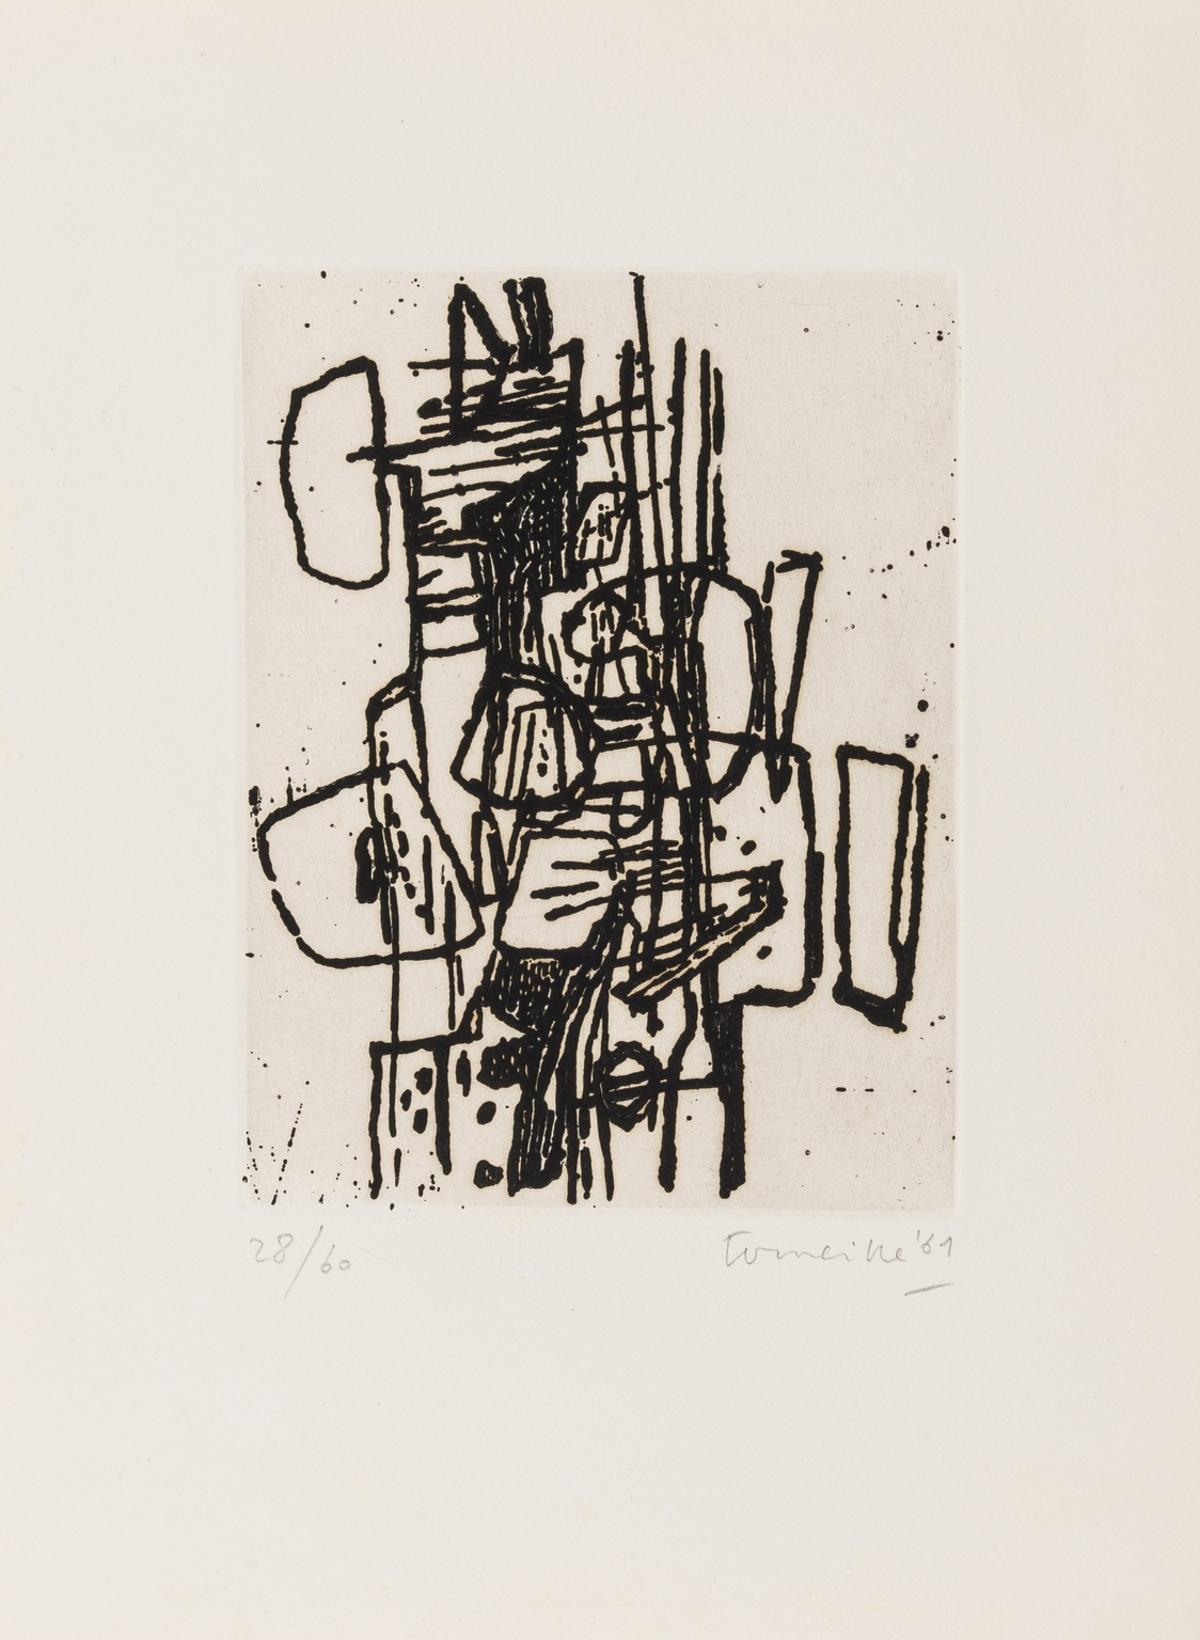 Corneille (1922-2010) Untitled